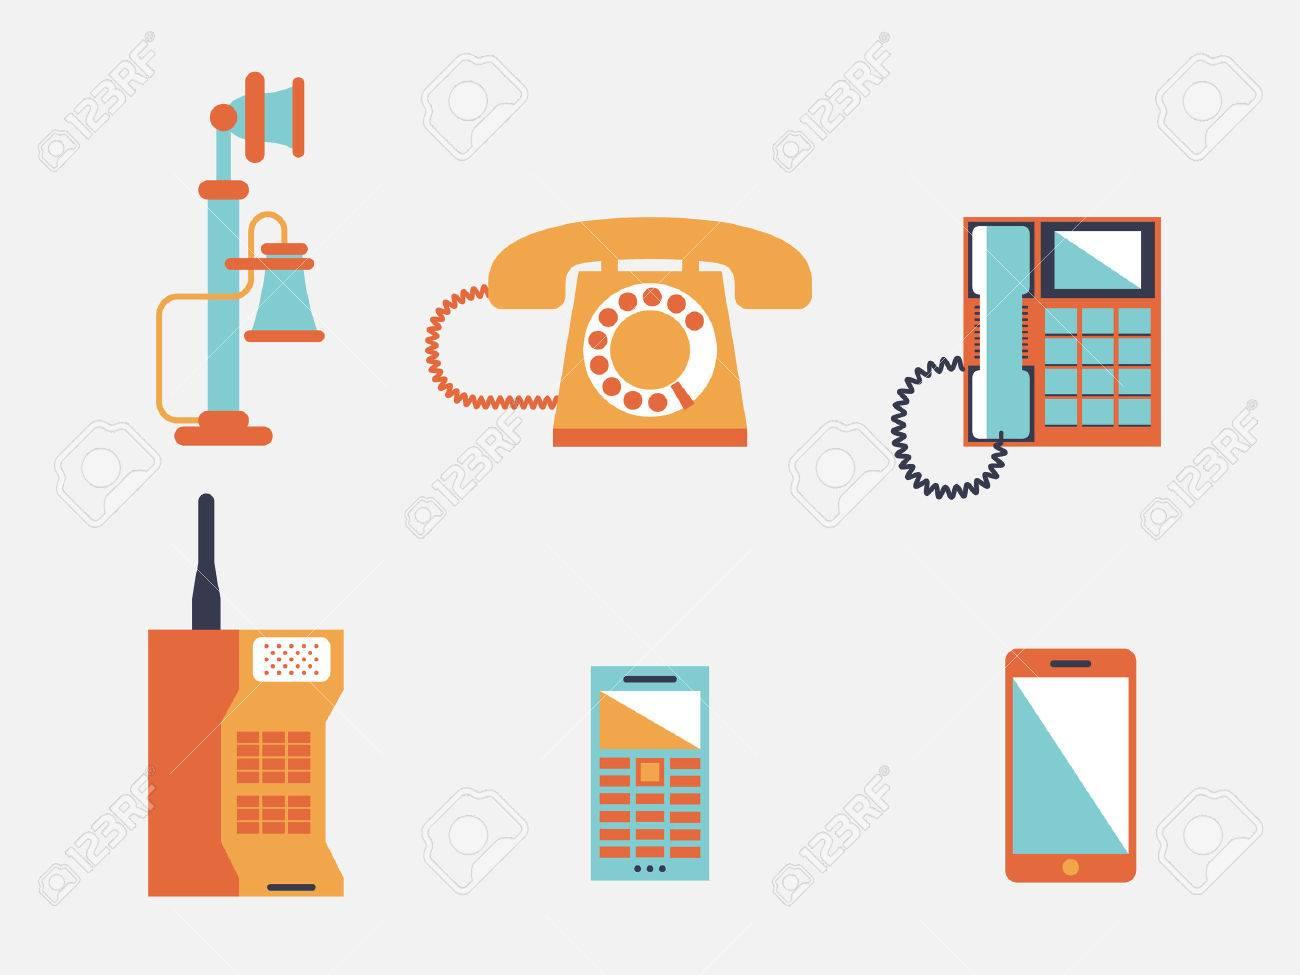 Phone icons, vector illustration - 26035969